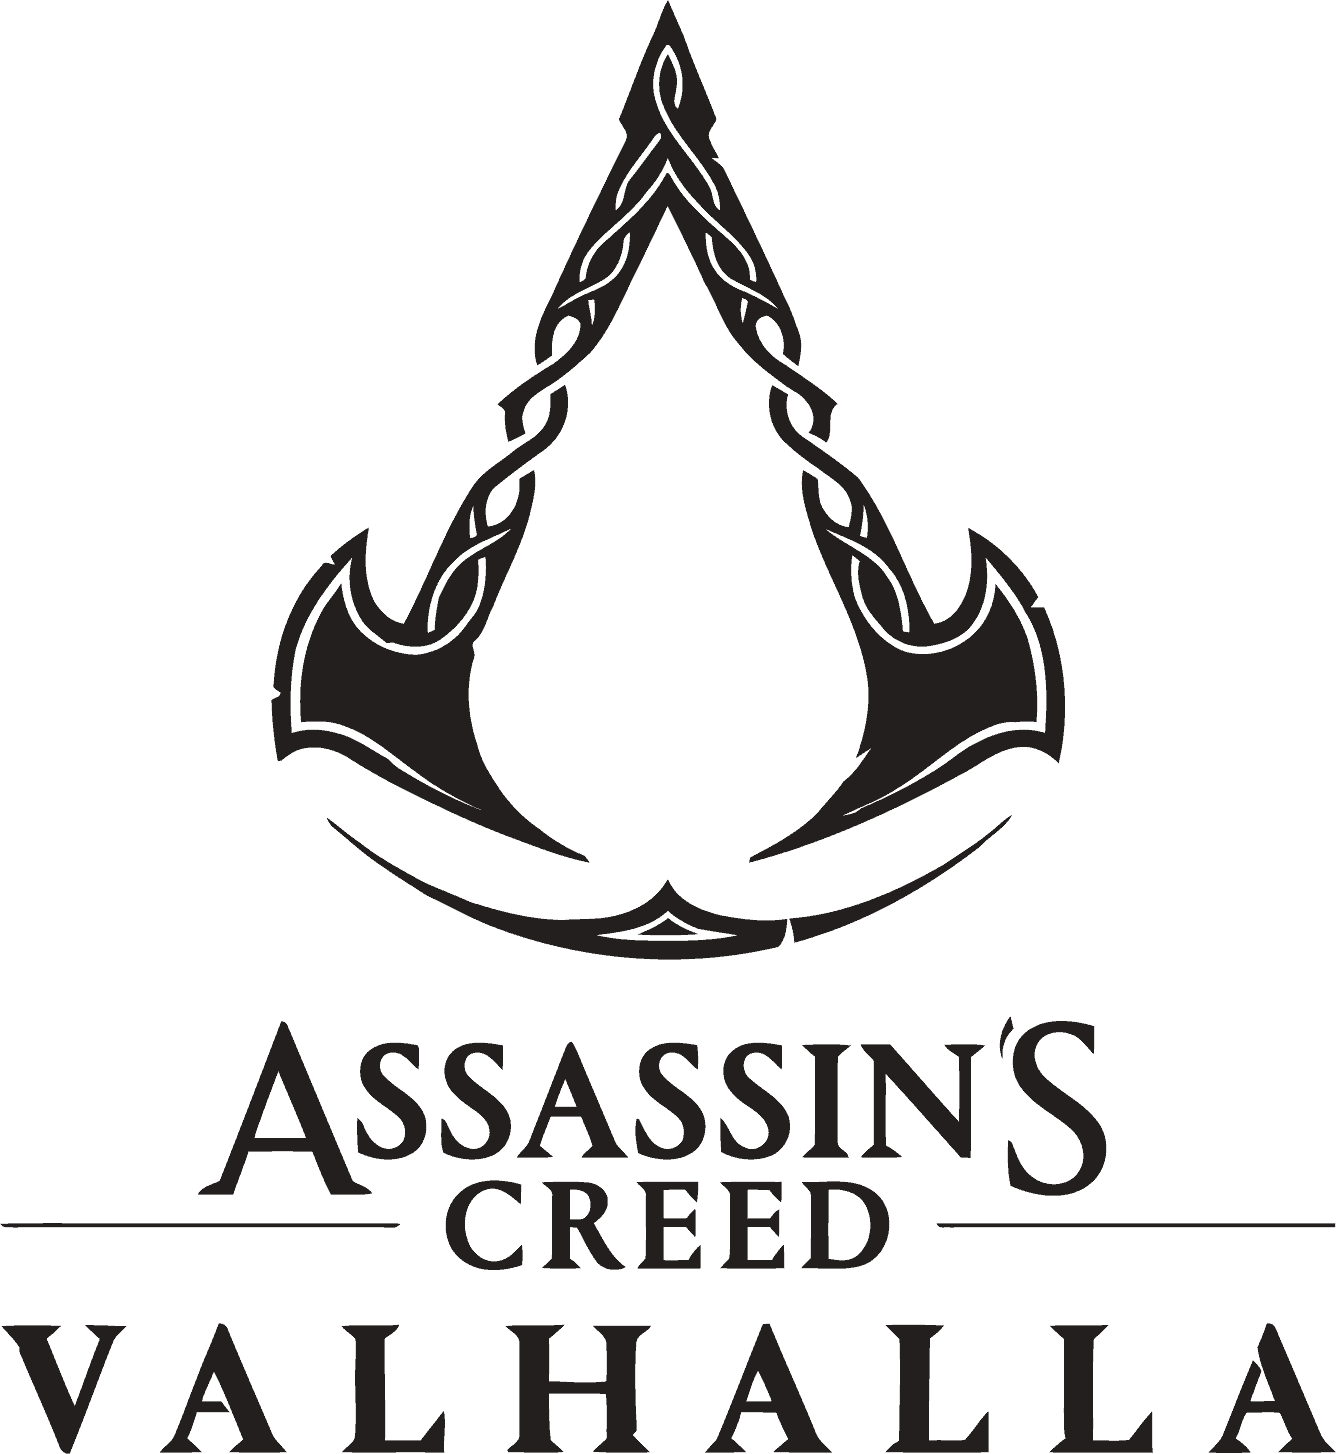 Assassins Creed Valhalla Logo png